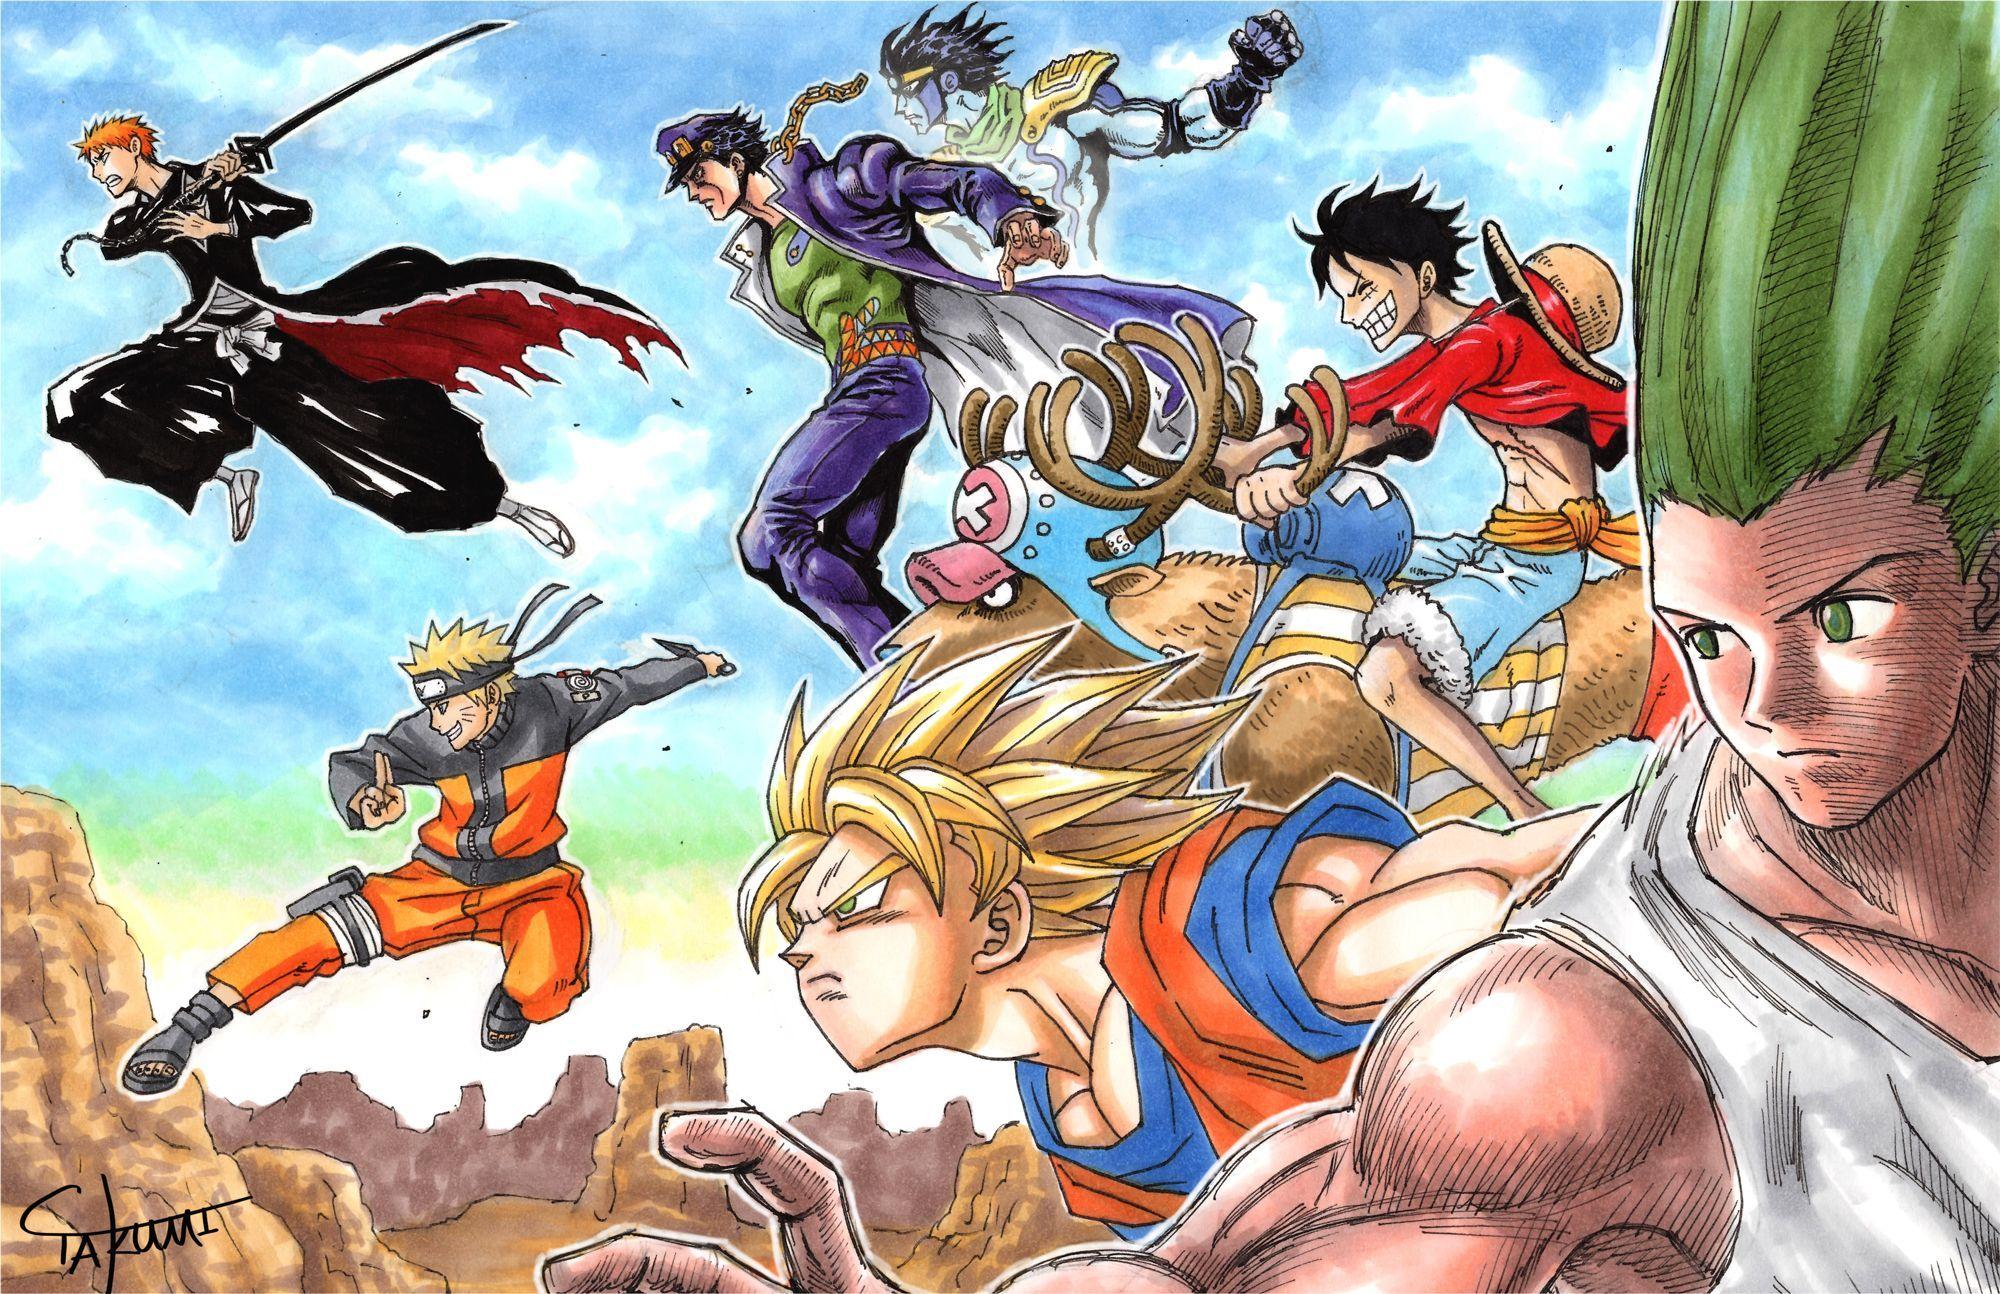 One Piece Dragon Ball Super Wallpaper Anime Crossover Hunter X Hunter Bleach Dragon Ball Z One Download Wallp Anime Crossover Anime Crossover Wallpaper Anime